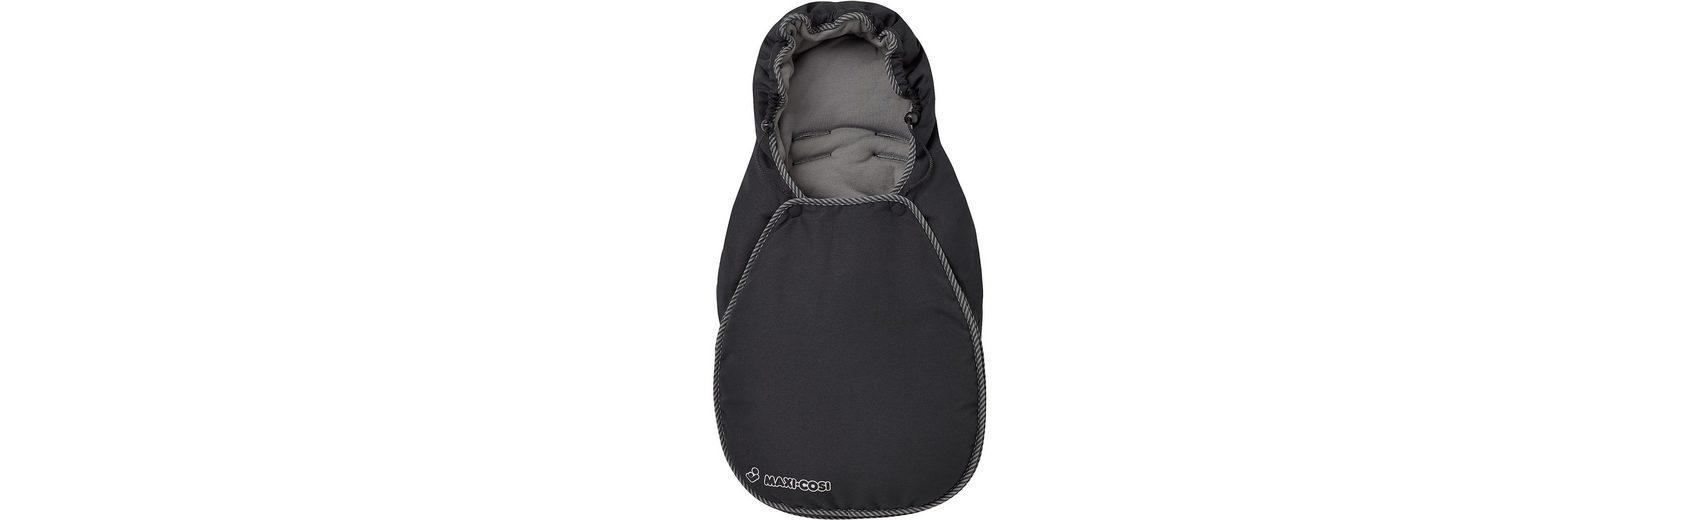 Maxi-Cosi Fußsack für Cabriofix und Citi, black raven